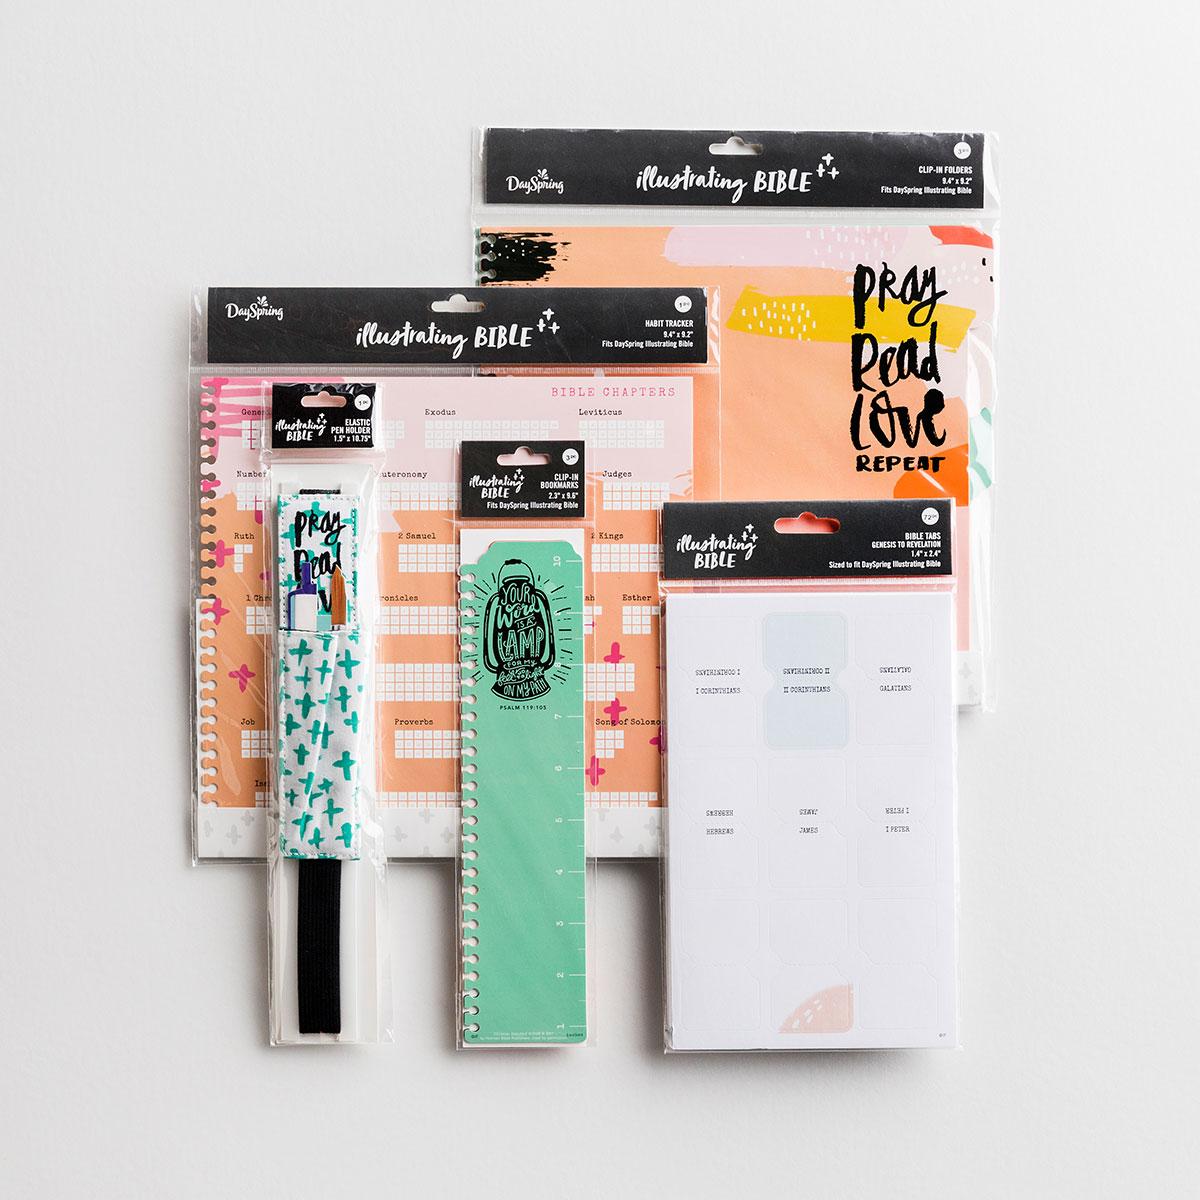 Illustrating Bible - Pray Read Love - Bible Tabs, Pen Holder, and Clip-In Bookmarks, Folders & Habit Tracker Gift Set